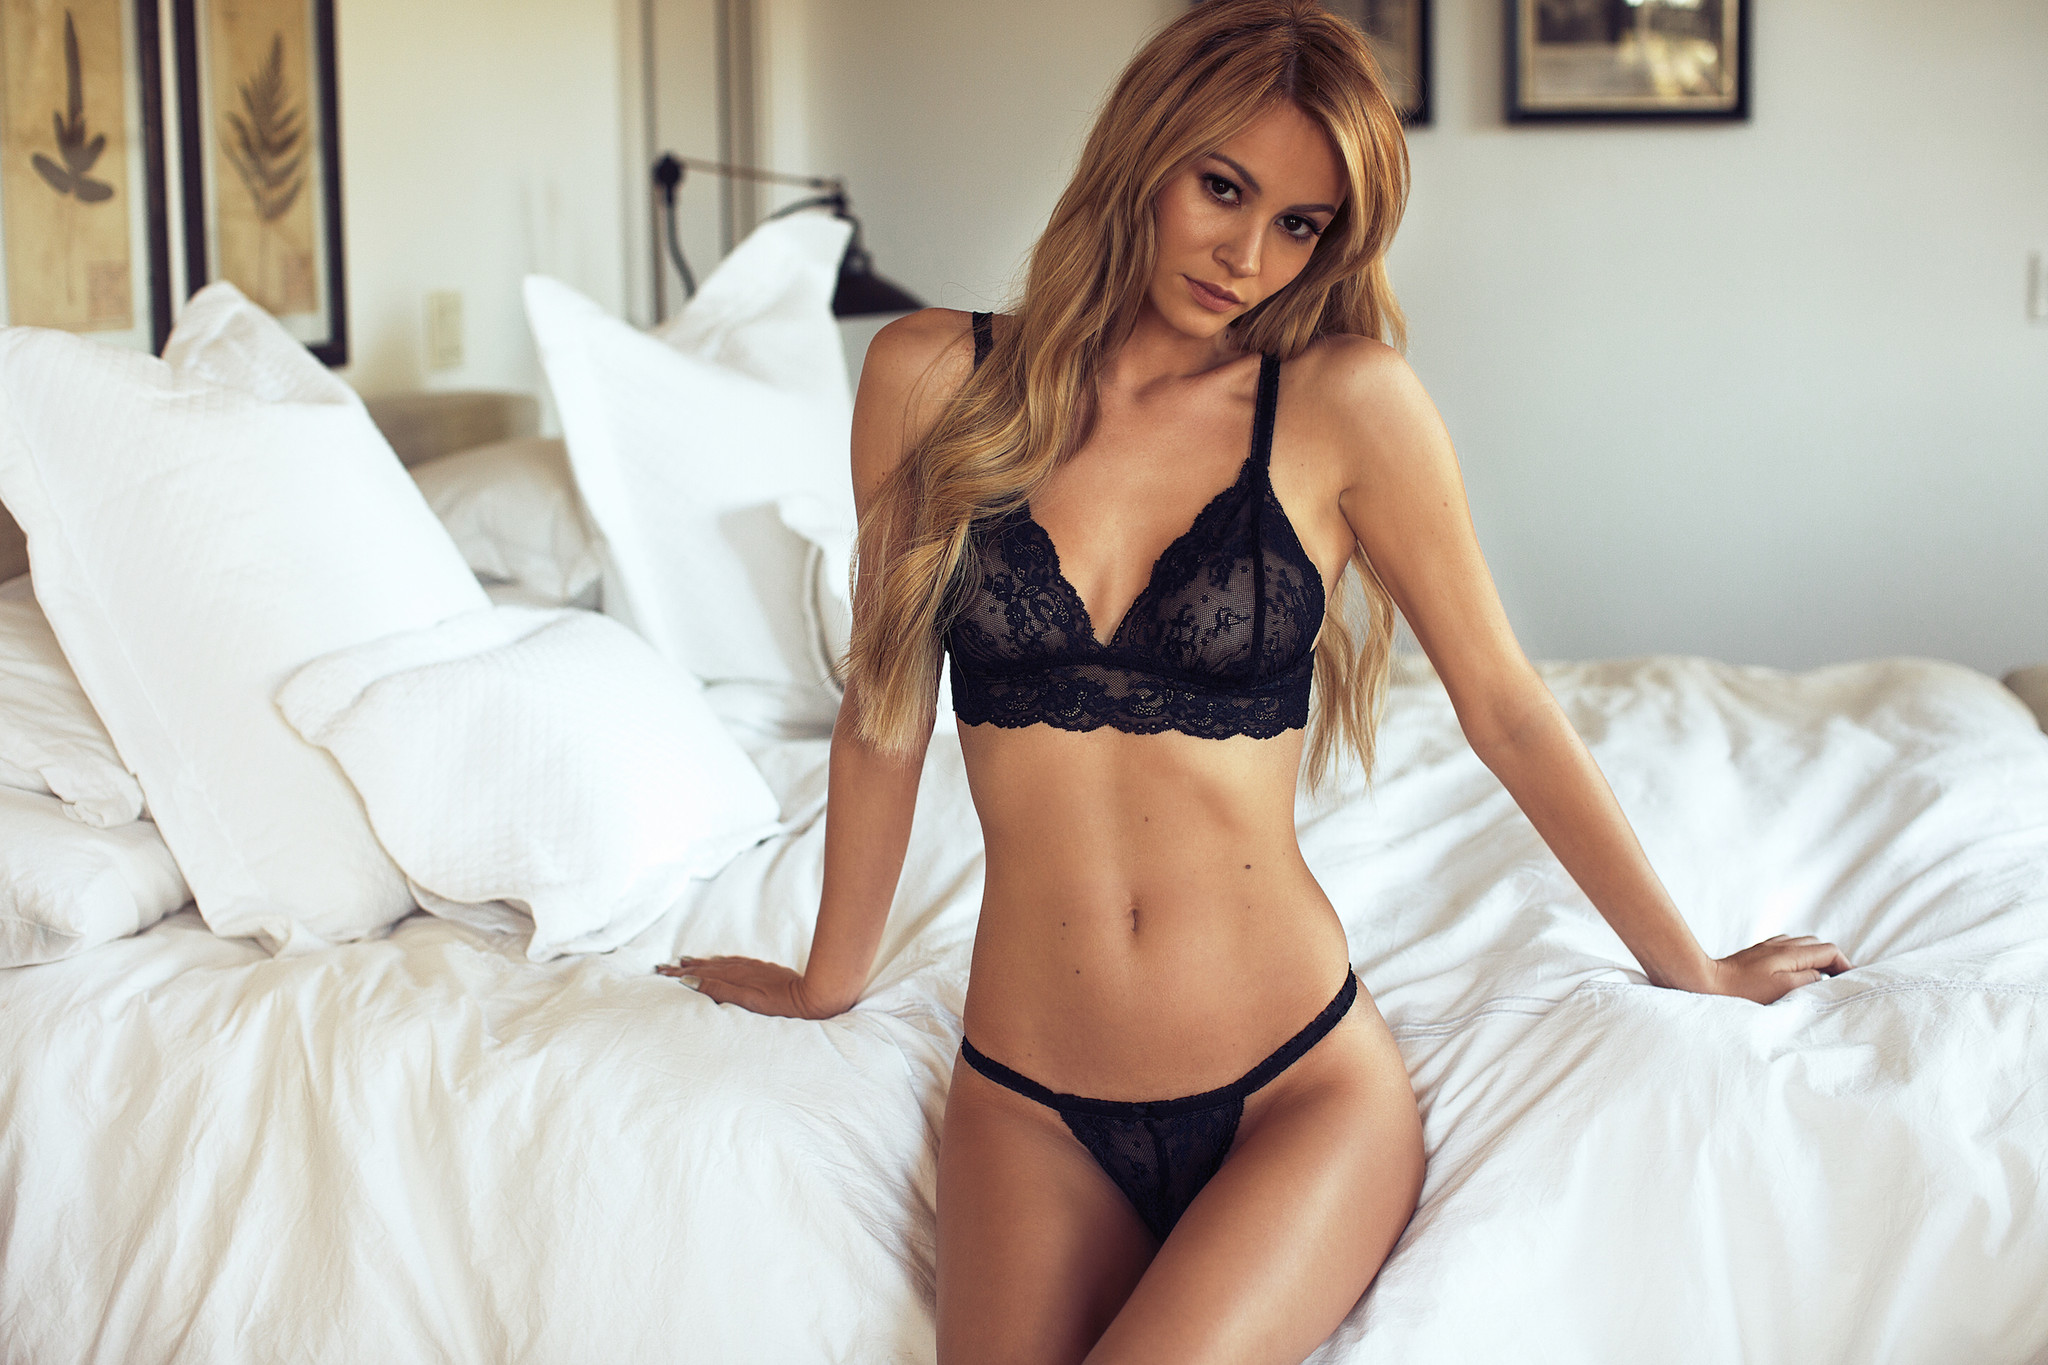 5075cc99509 ... Women Girl Sexy Underwear Strap Lace Embroidery Bra Black Set Panties